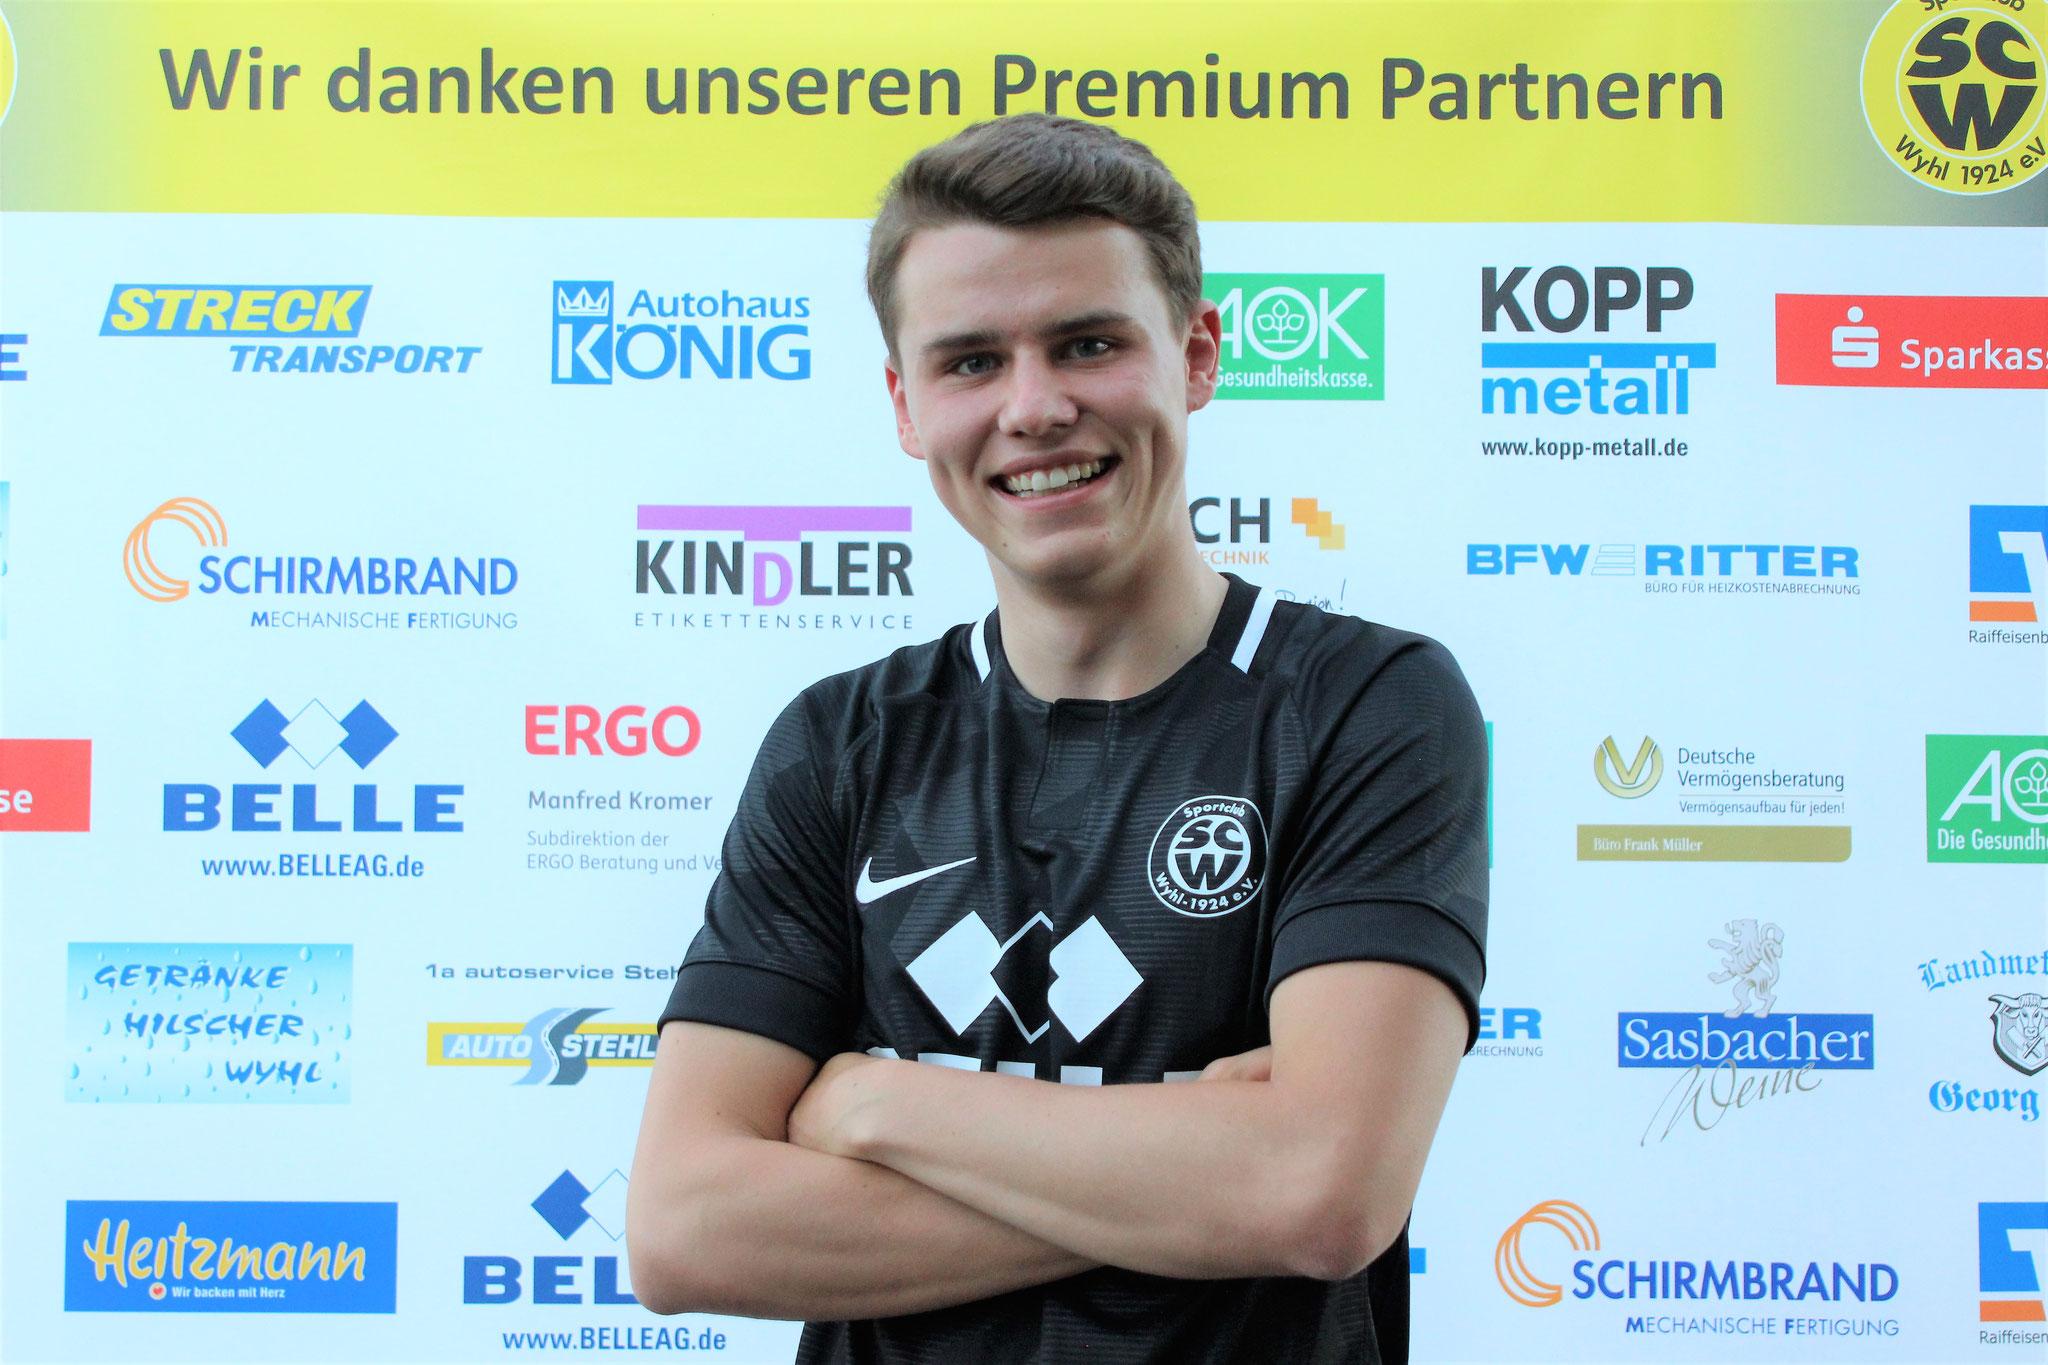 Dennis Thoma (SC Kiechlinsbergen)